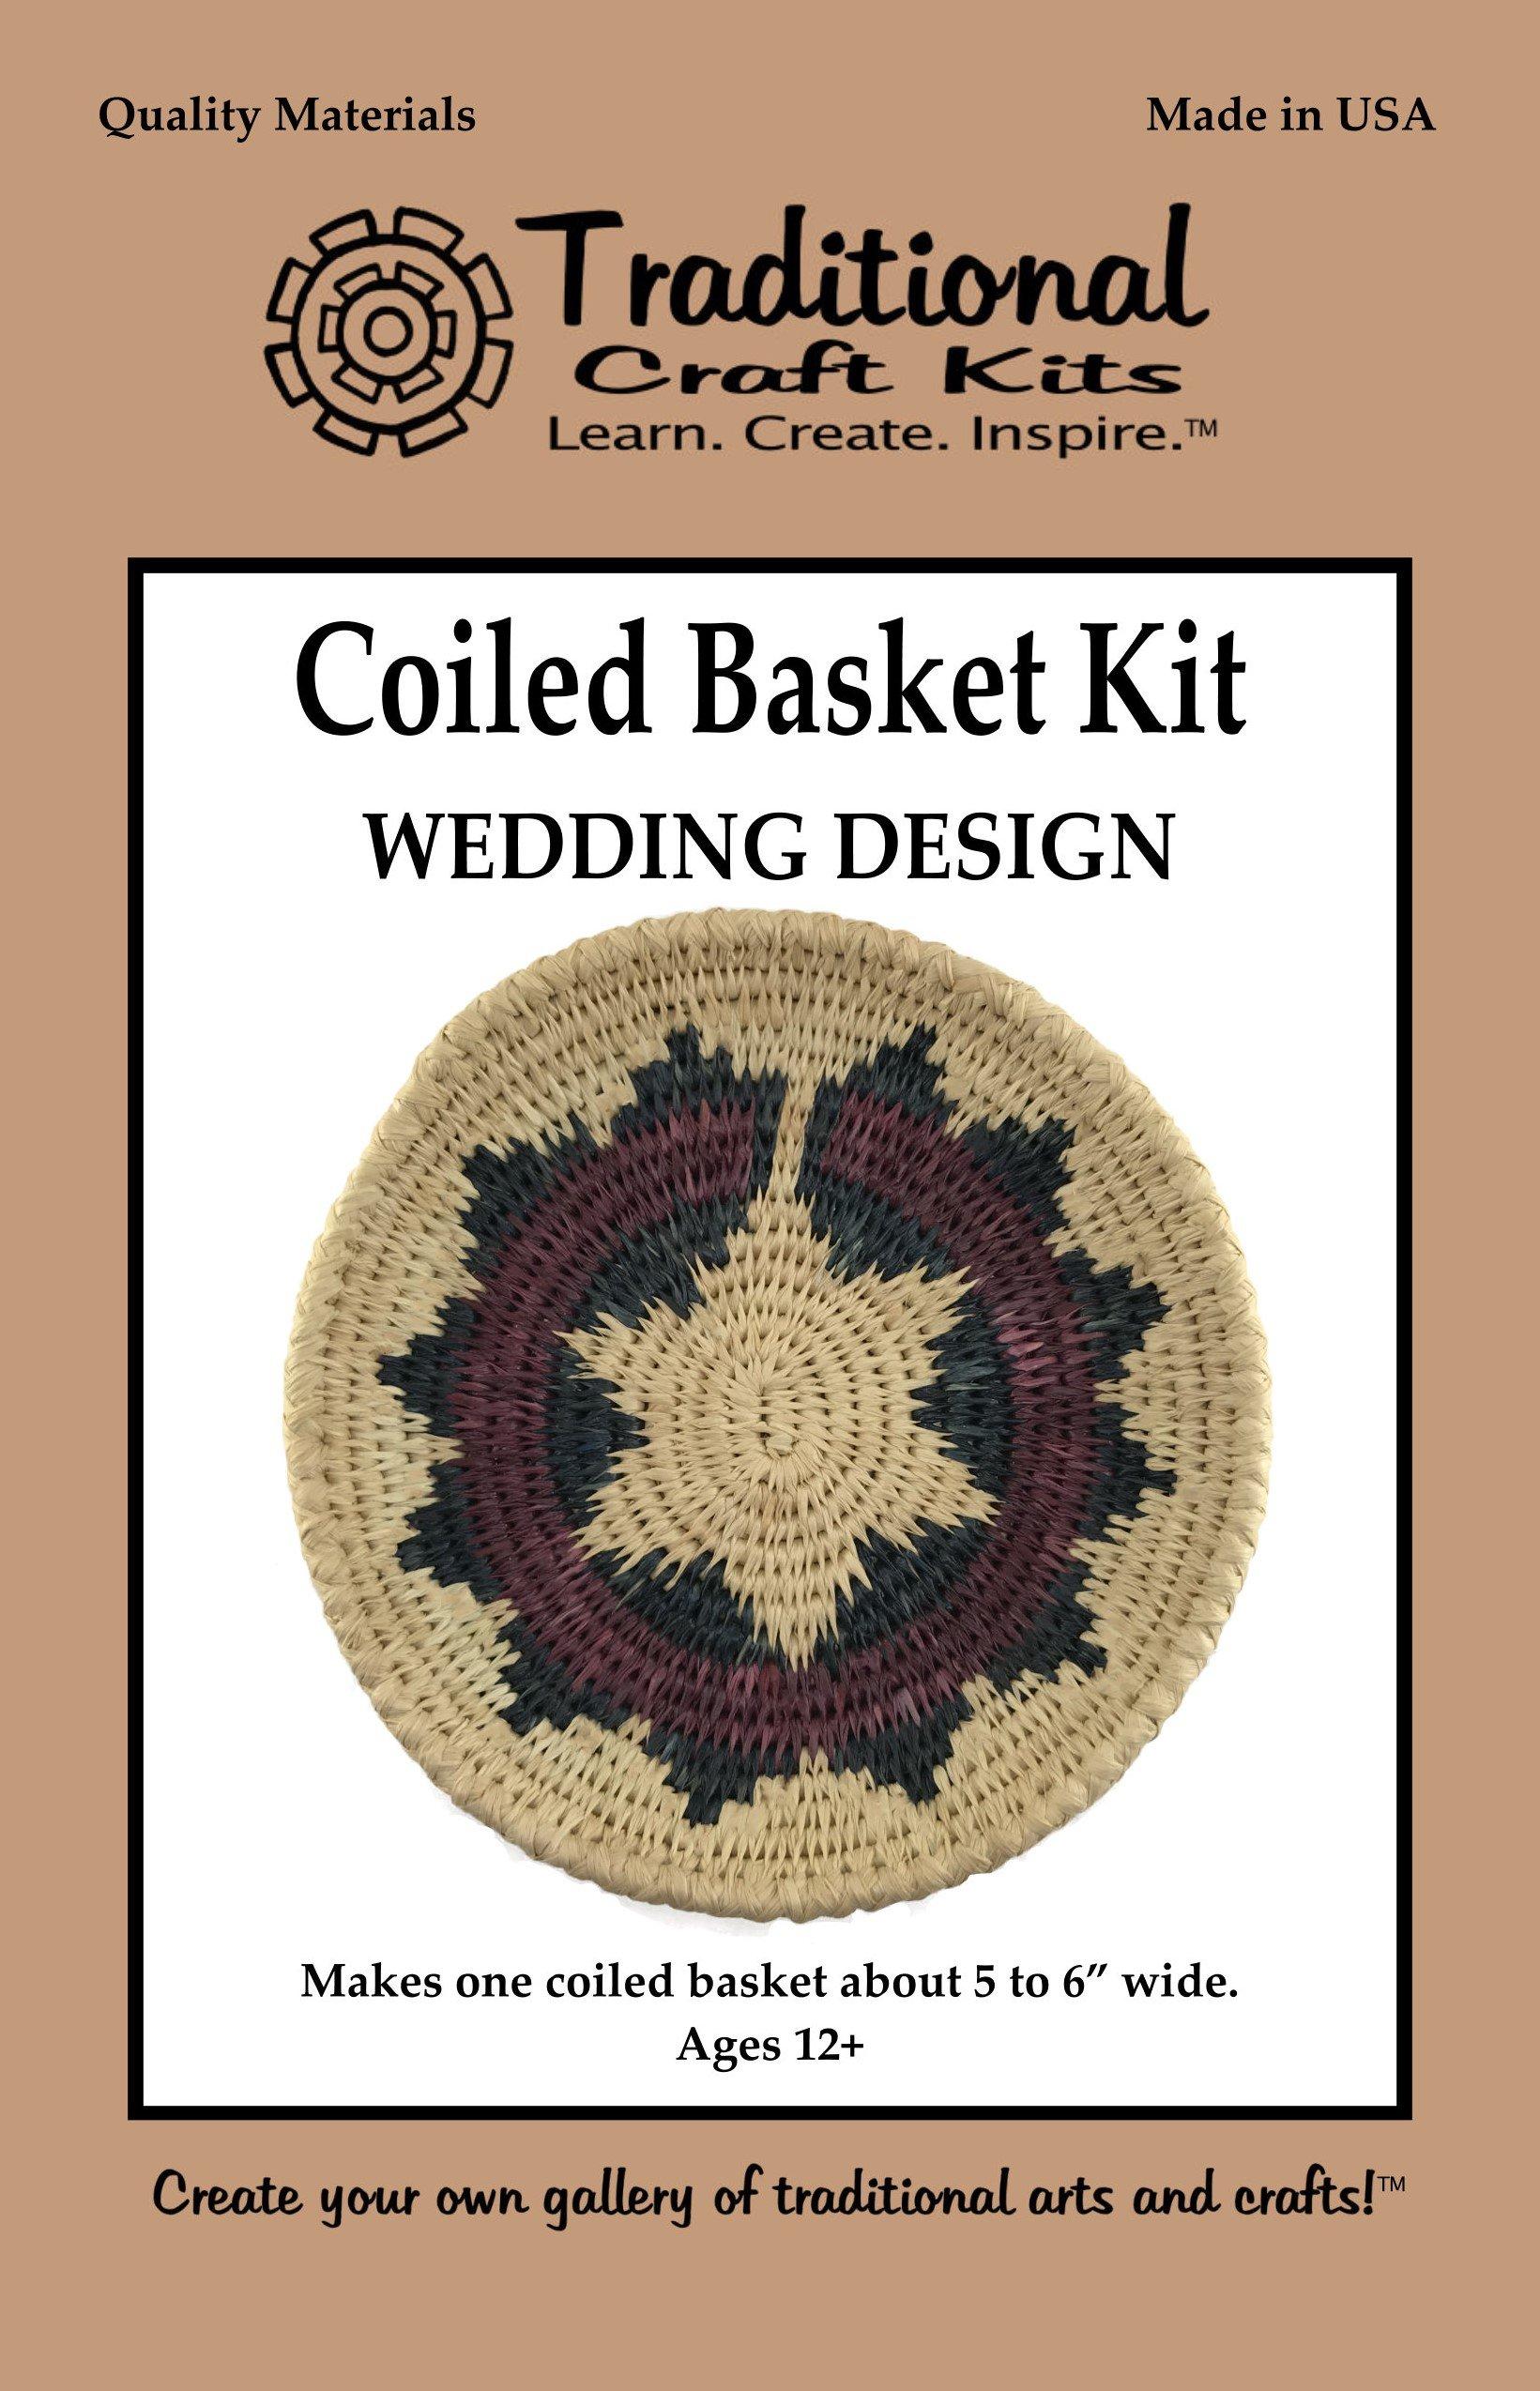 Coiled Basket Kit - Wedding Design